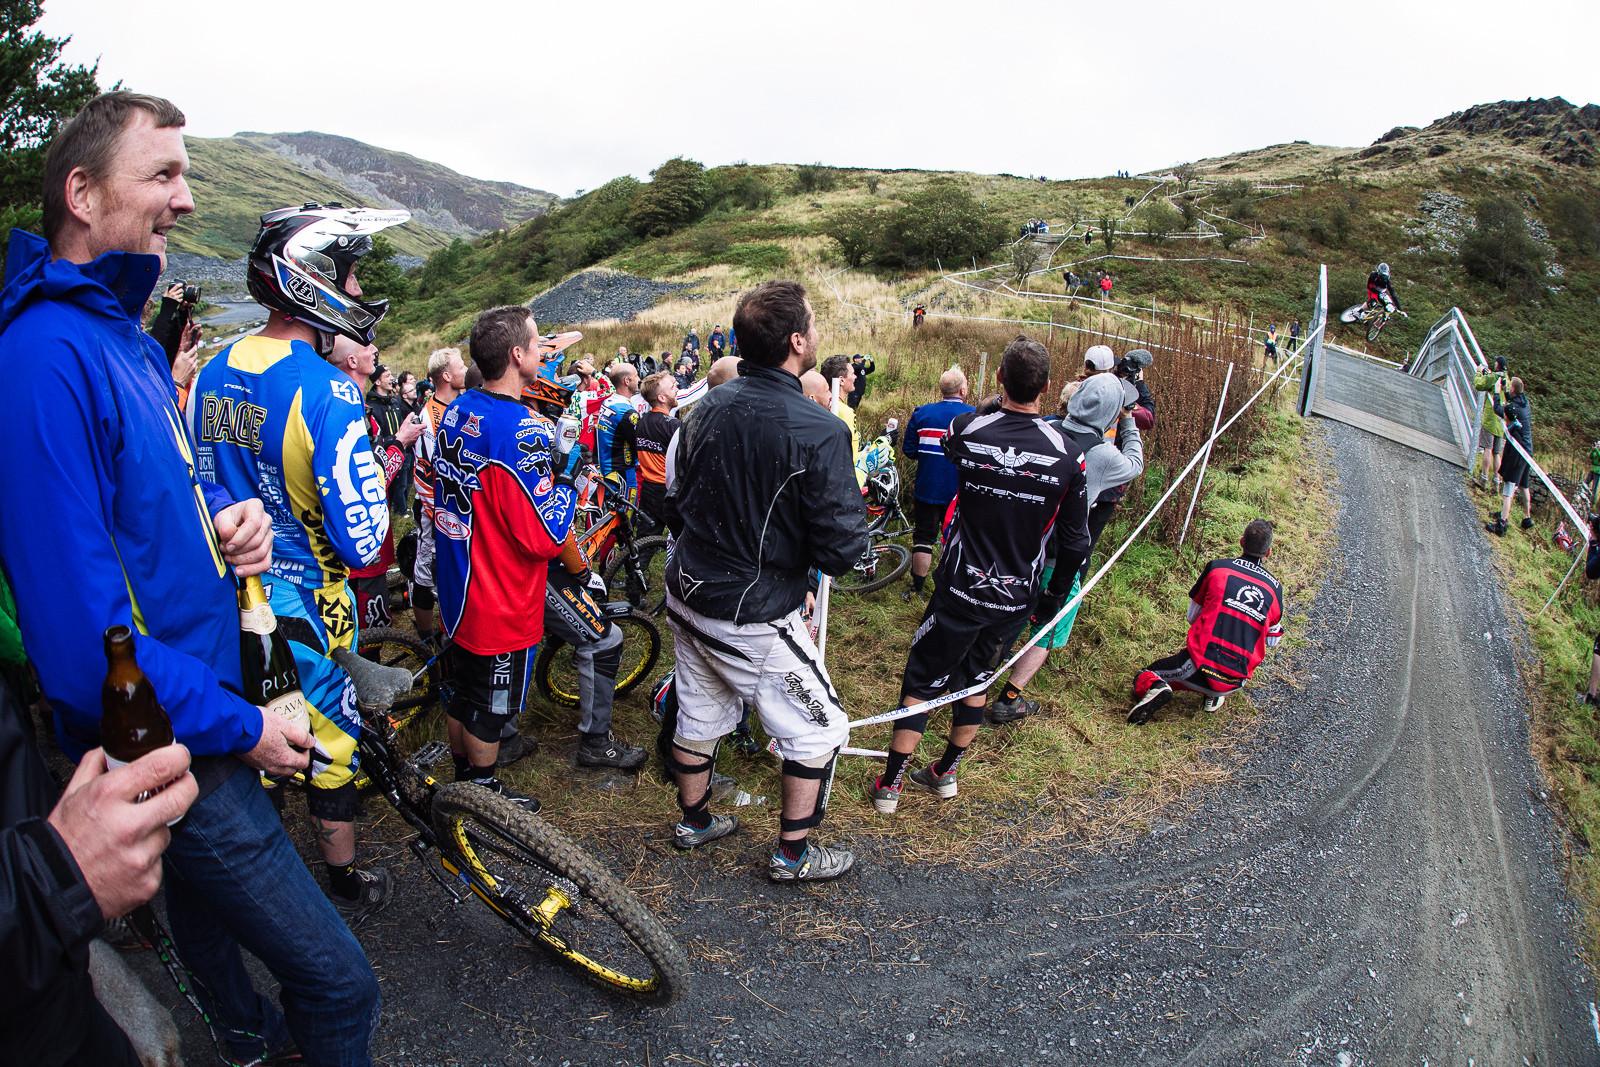 Wil Longden, BDS Legends Race - 2015 British Downhill Series Finals - Mountain Biking Pictures - Vital MTB